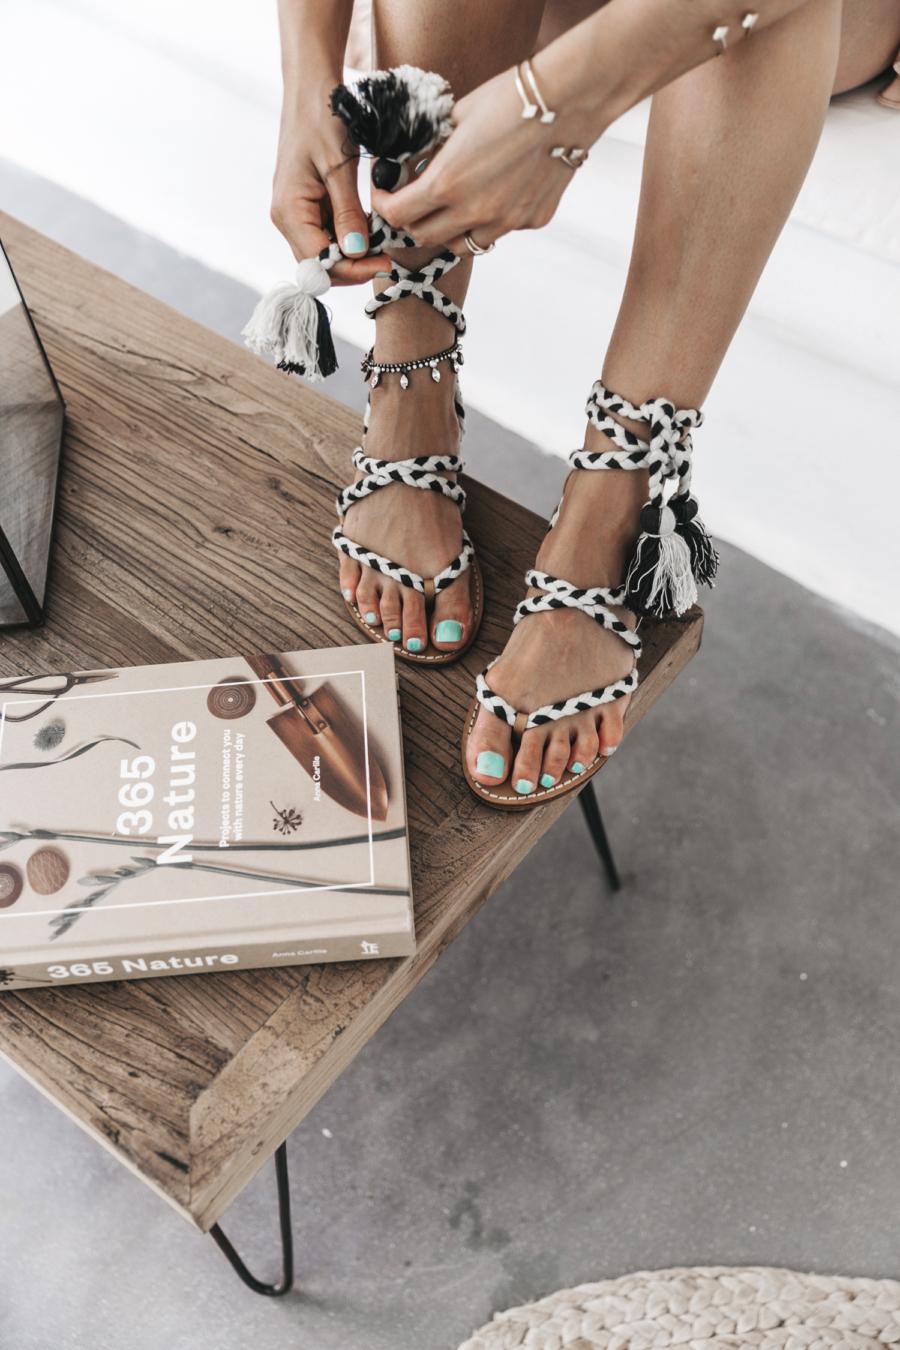 Wrap Sandals - 10 Key Spring and Summer Wardrobe Essentials // NotJessFashion.com